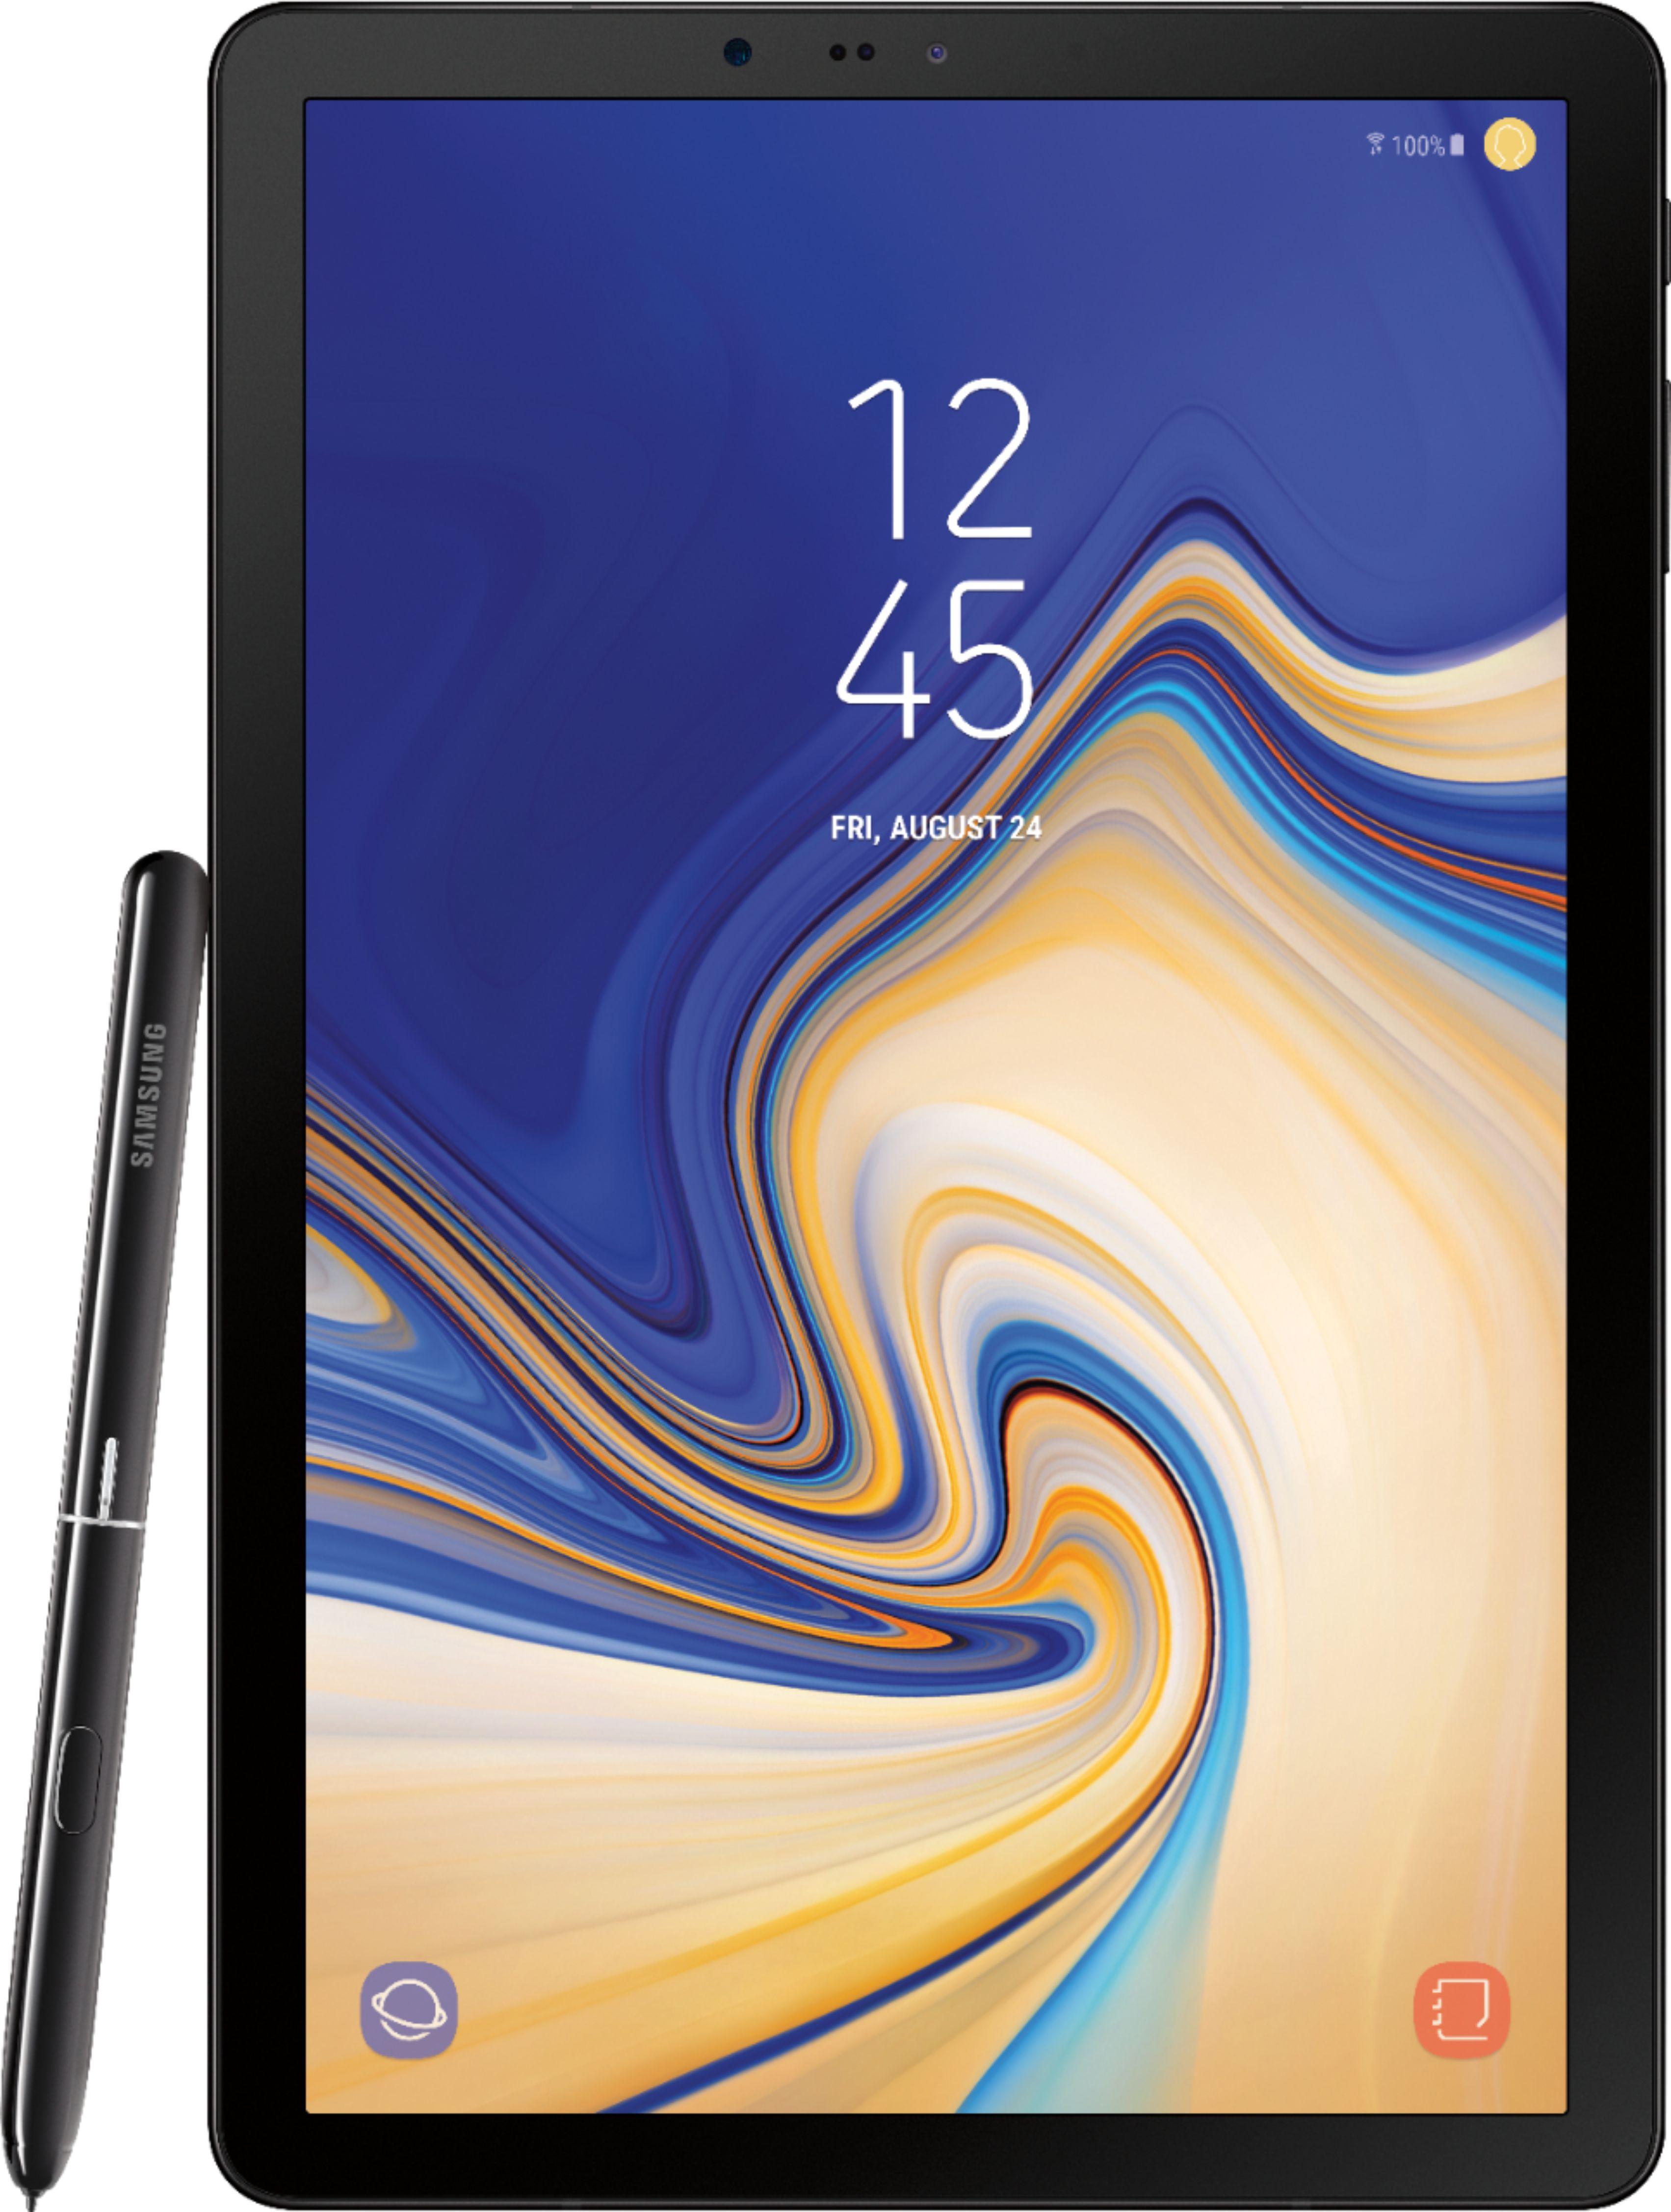 Galaxy Tab S4 64gb best buy open box $219 YMMV